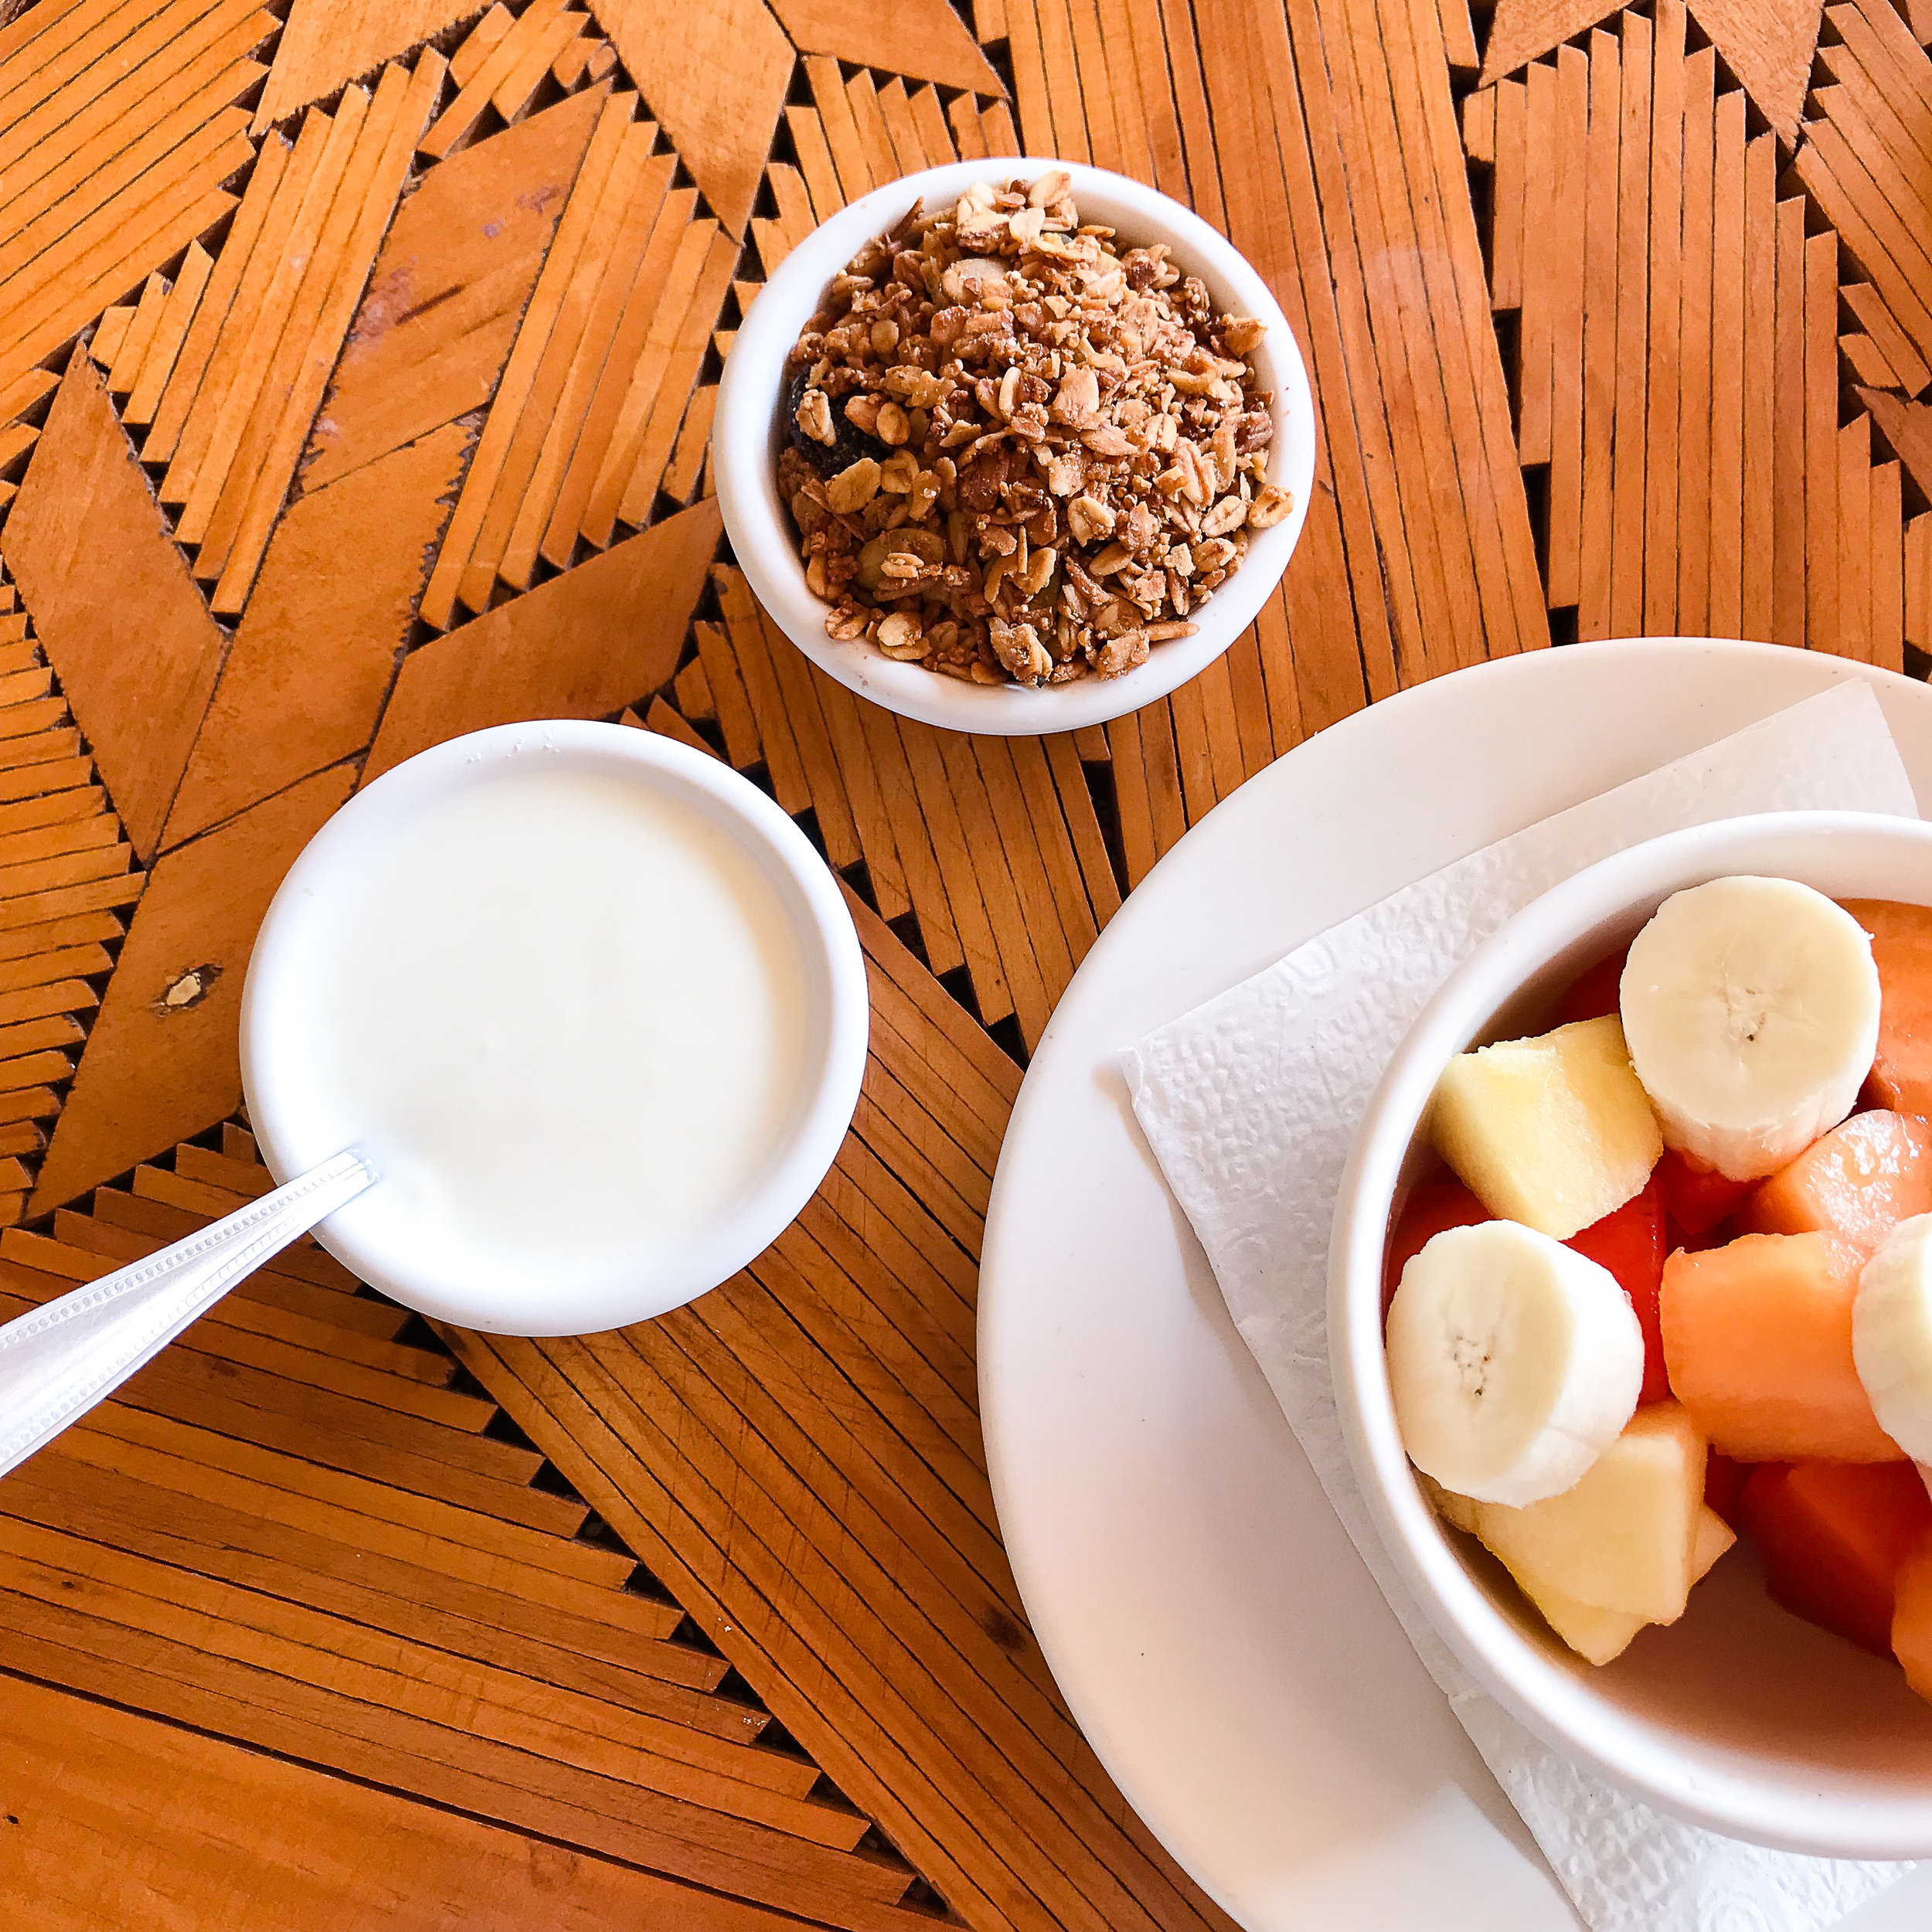 mexican-food-san-miguel-de-allende-restuarants-coffee-cafes-19.jpg